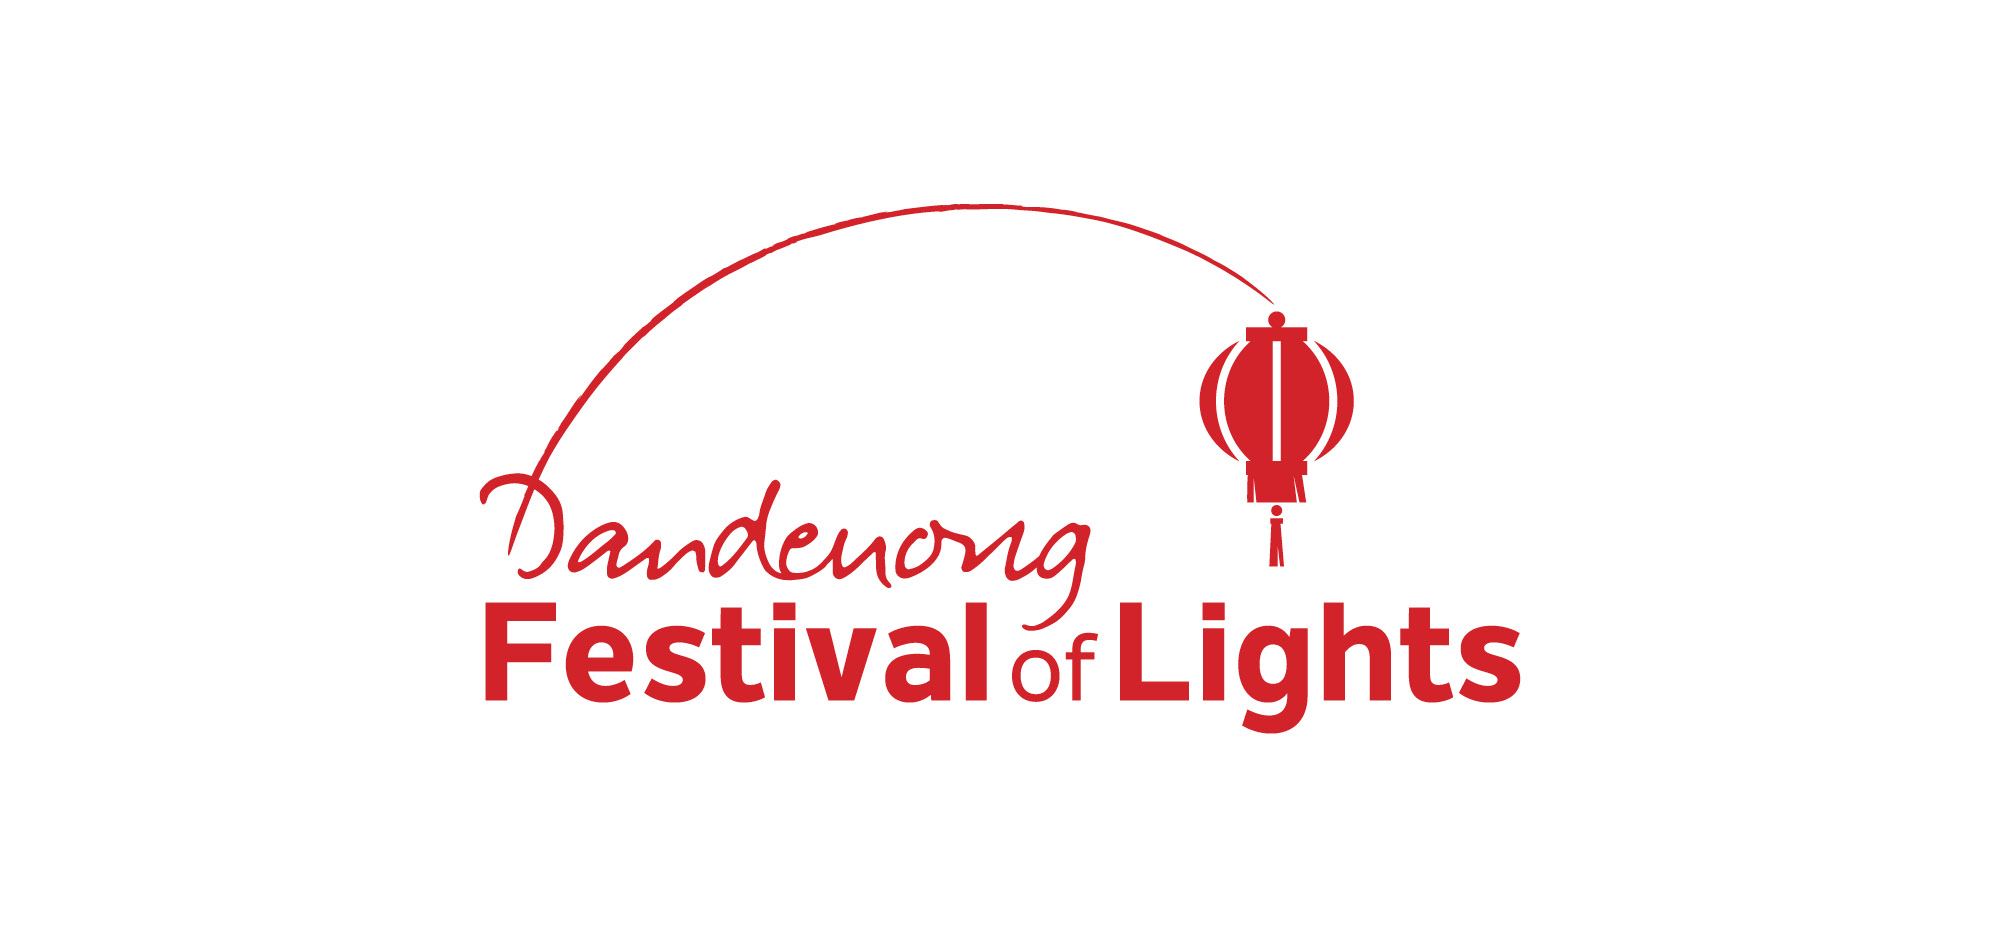 logo_design_mornington_dandenong_light_festival2